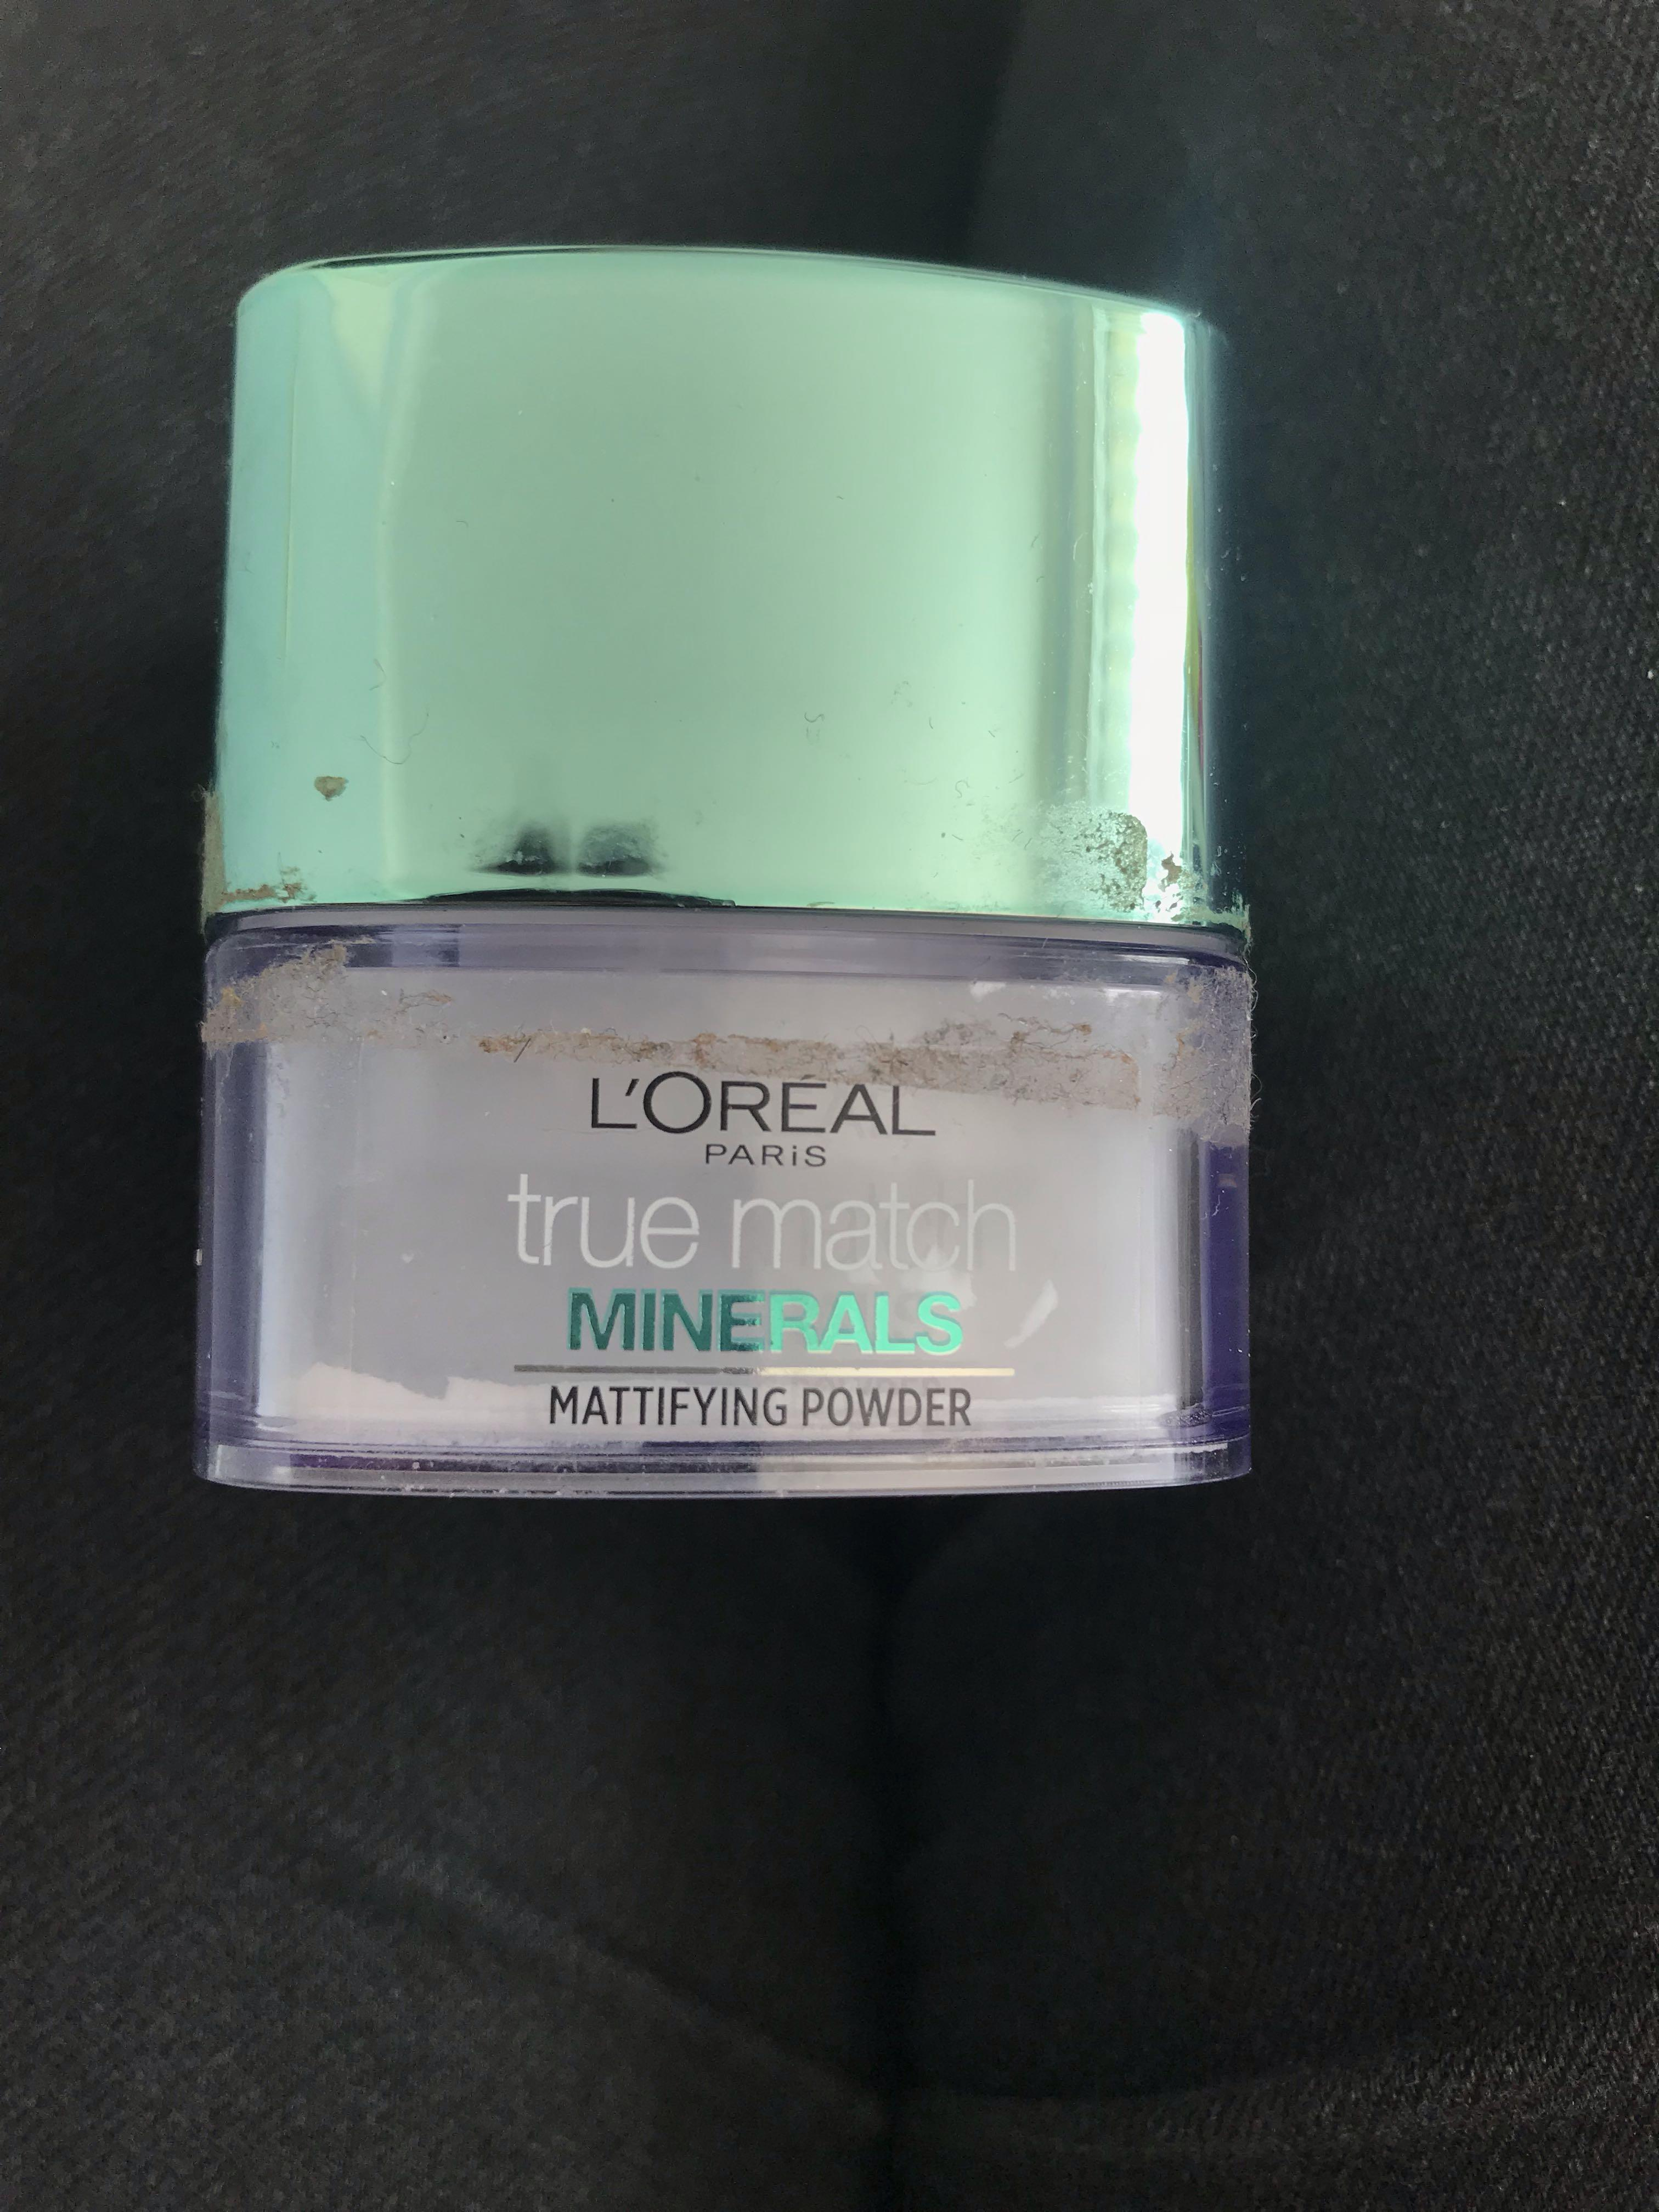 L'oreal True Match Minerals Mattifying Finishing Powder